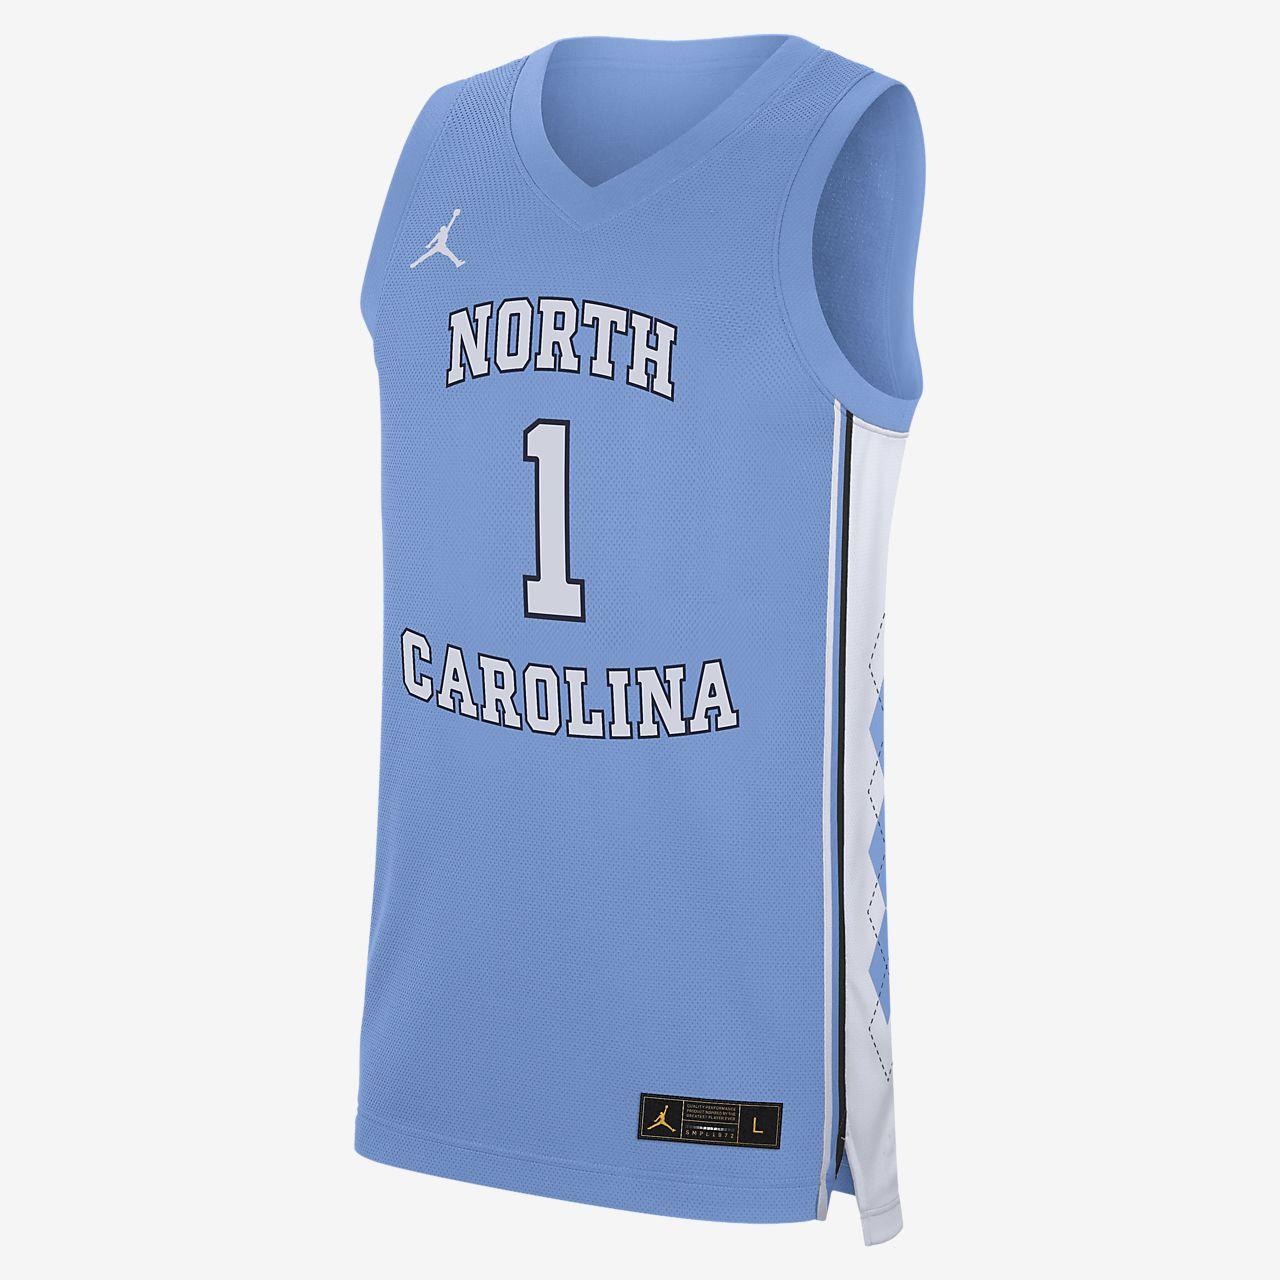 Nike College Replica (UNC) Men's Basketball Jersey